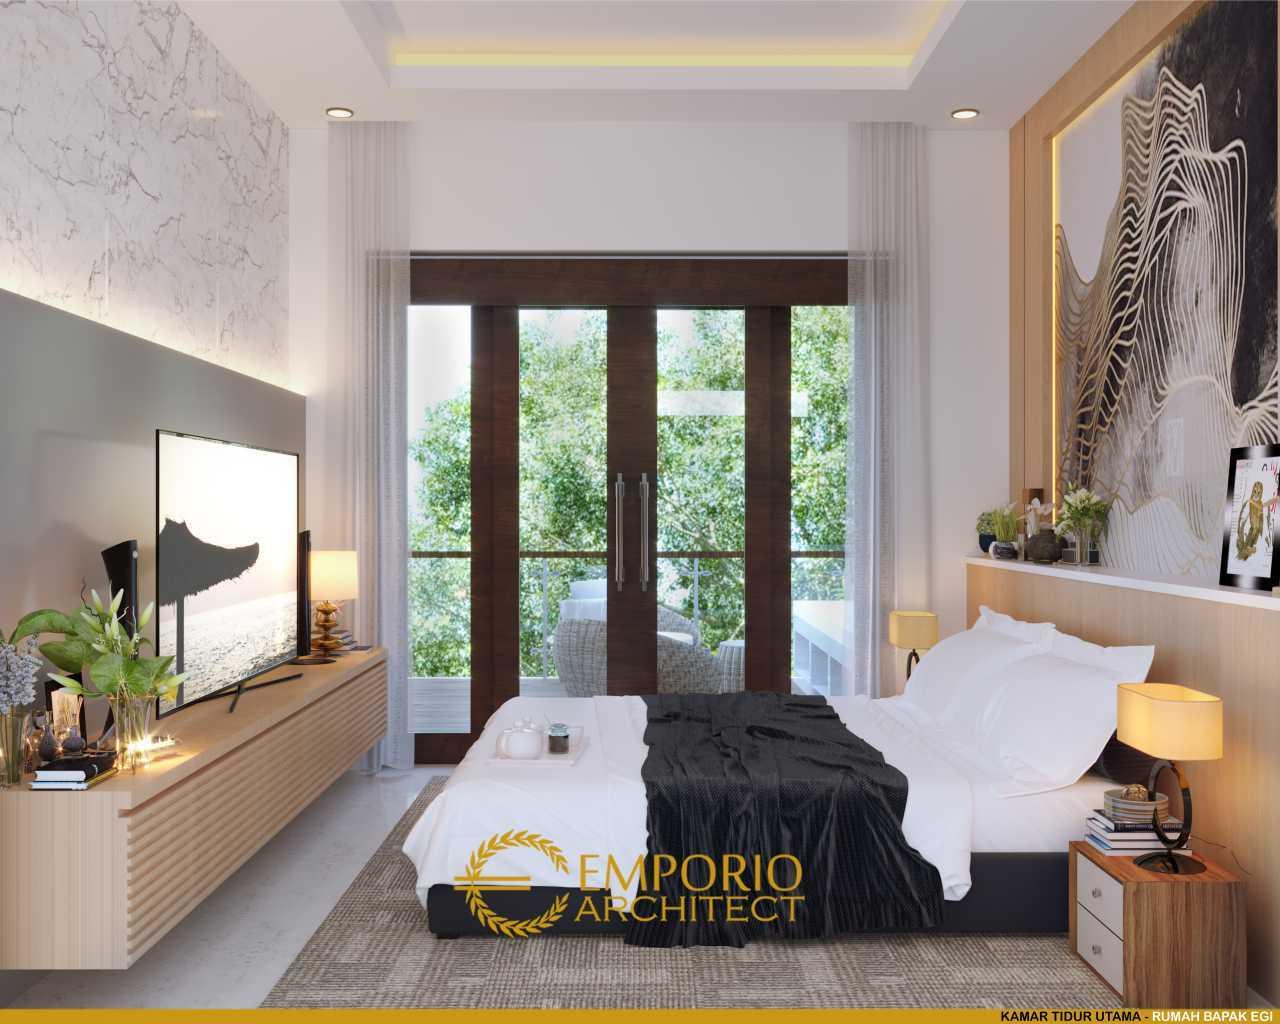 Emporio Architect Jasa Arsitek Denpasar Desain Rumah Modern 3 Lantai 734 @ Denpasar, Bali Kota Denpasar, Bali, Indonesia Kota Denpasar, Bali, Indonesia Emporio-Architect-Jasa-Arsitek-Denpasar-Desain-Rumah-Modern-3-Lantai-734-Denpasar-Bali   93968